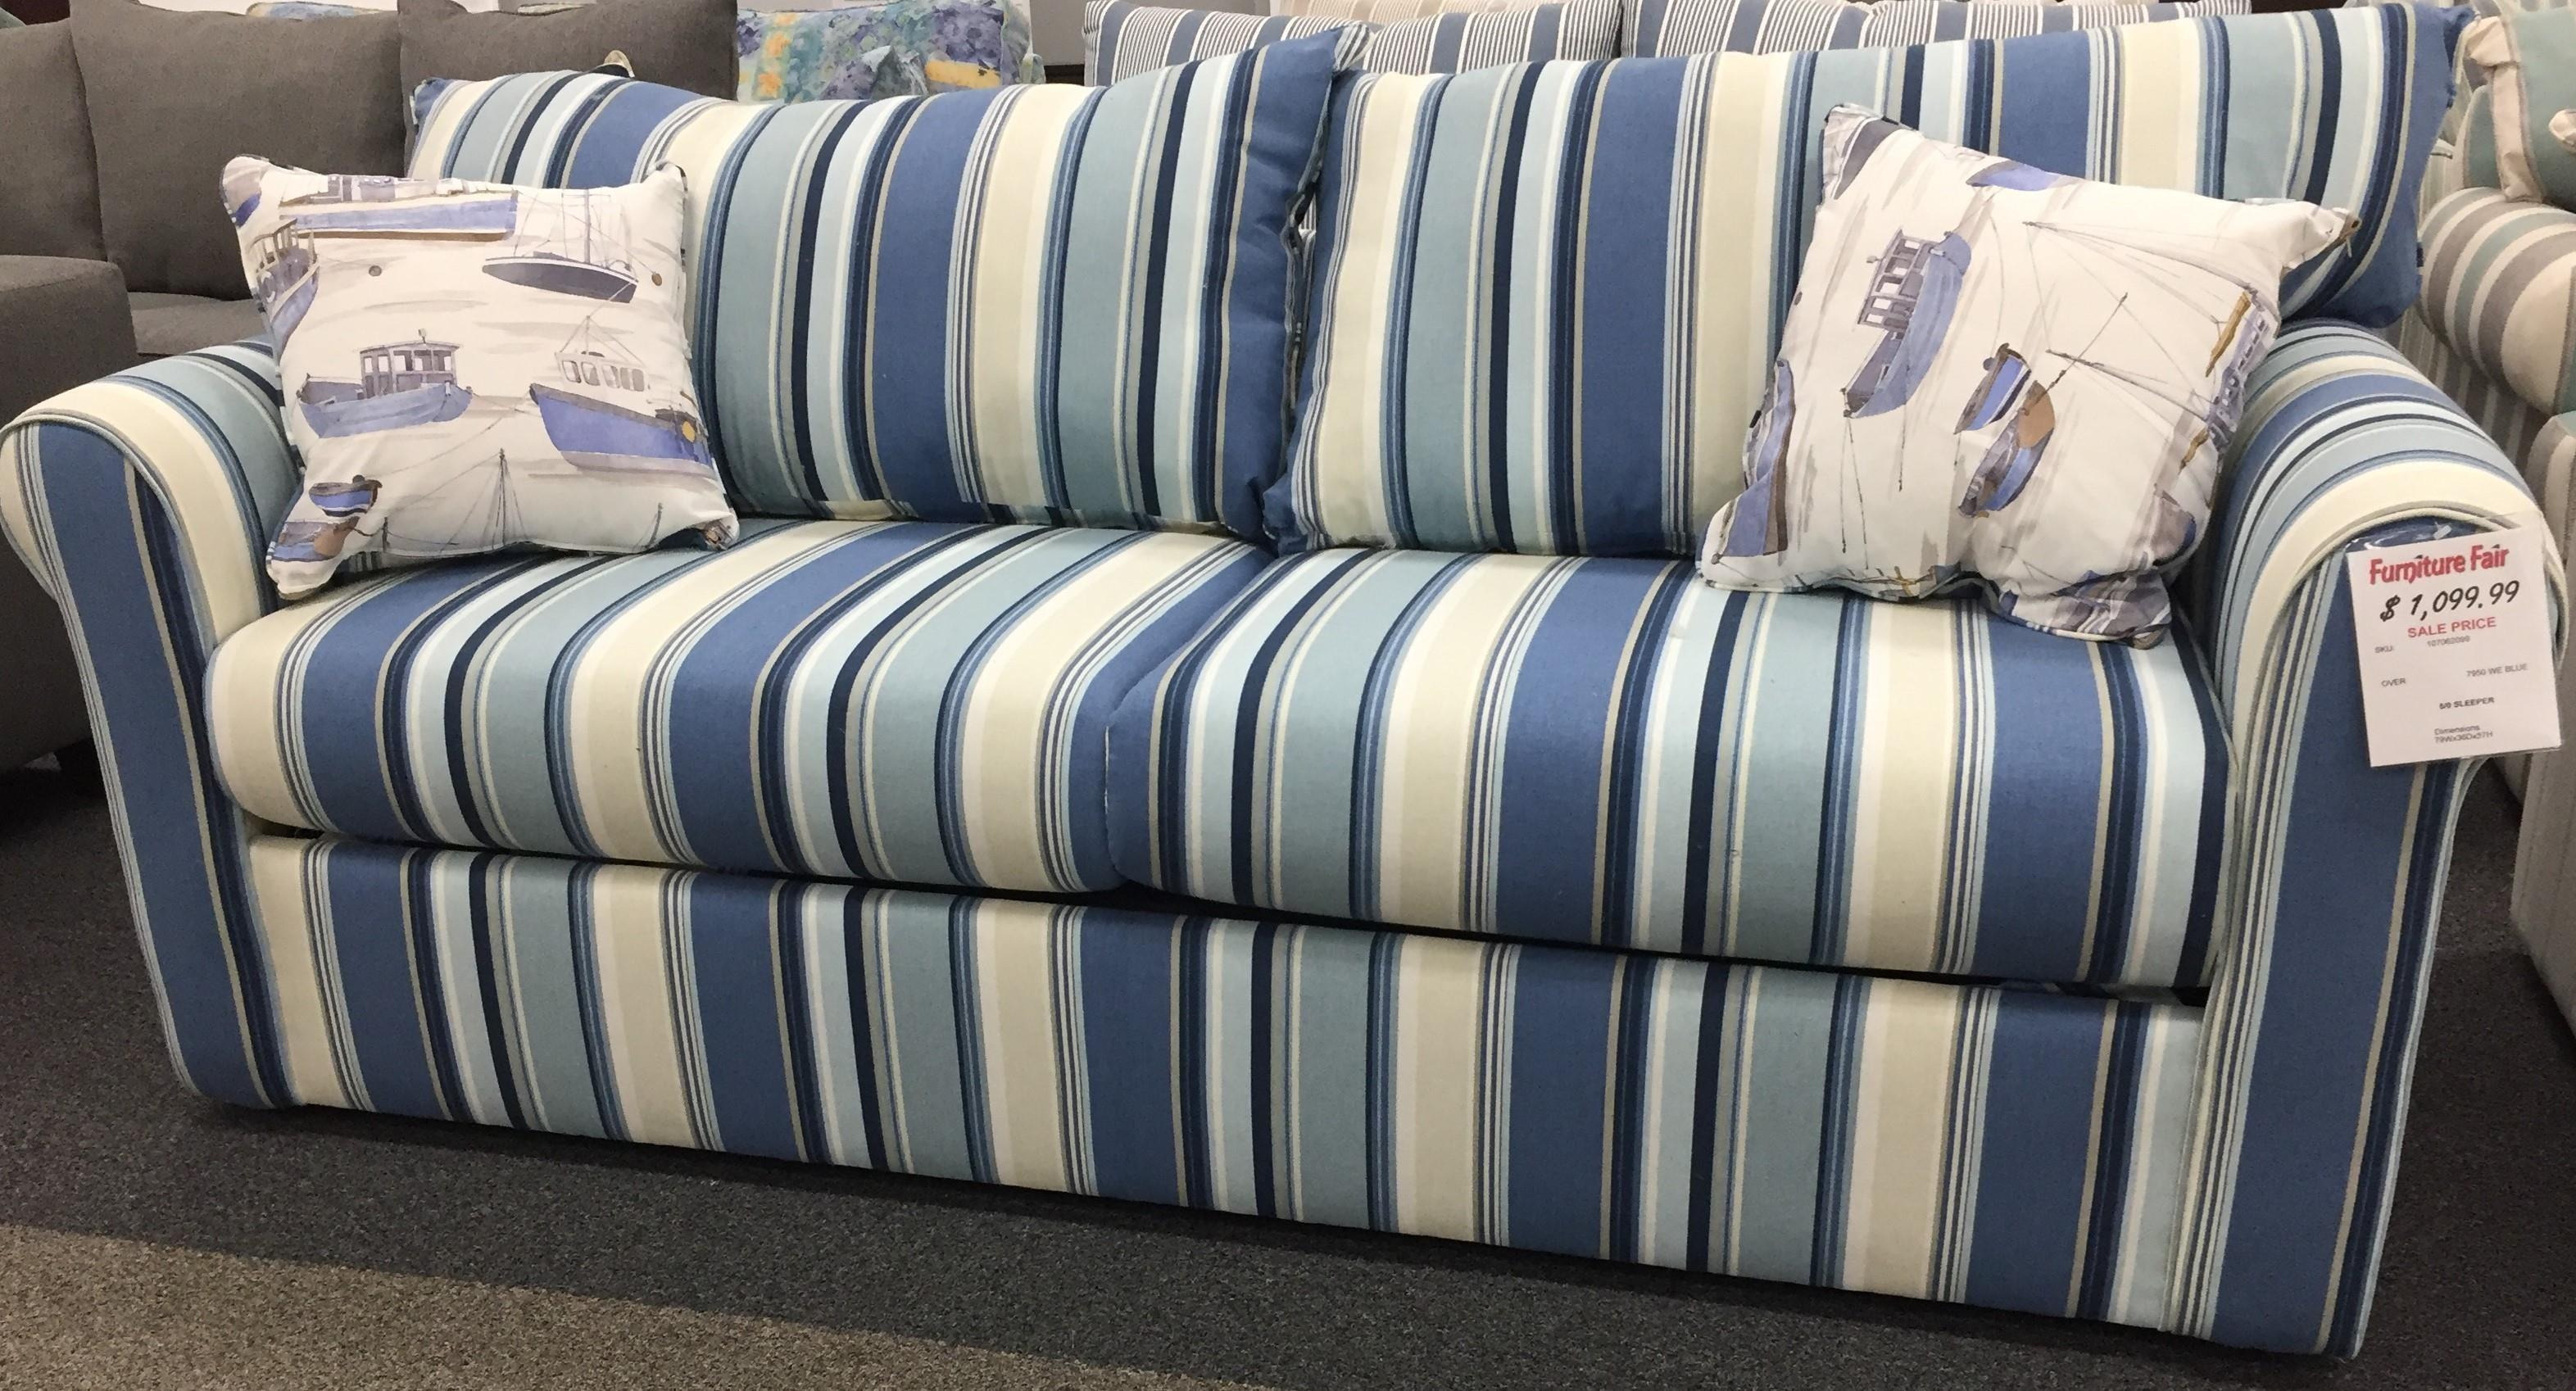 Coastal Sleeper Collection Queen Sleeper-  Westpod Blue by Overnight Sofa at Furniture Fair - North Carolina